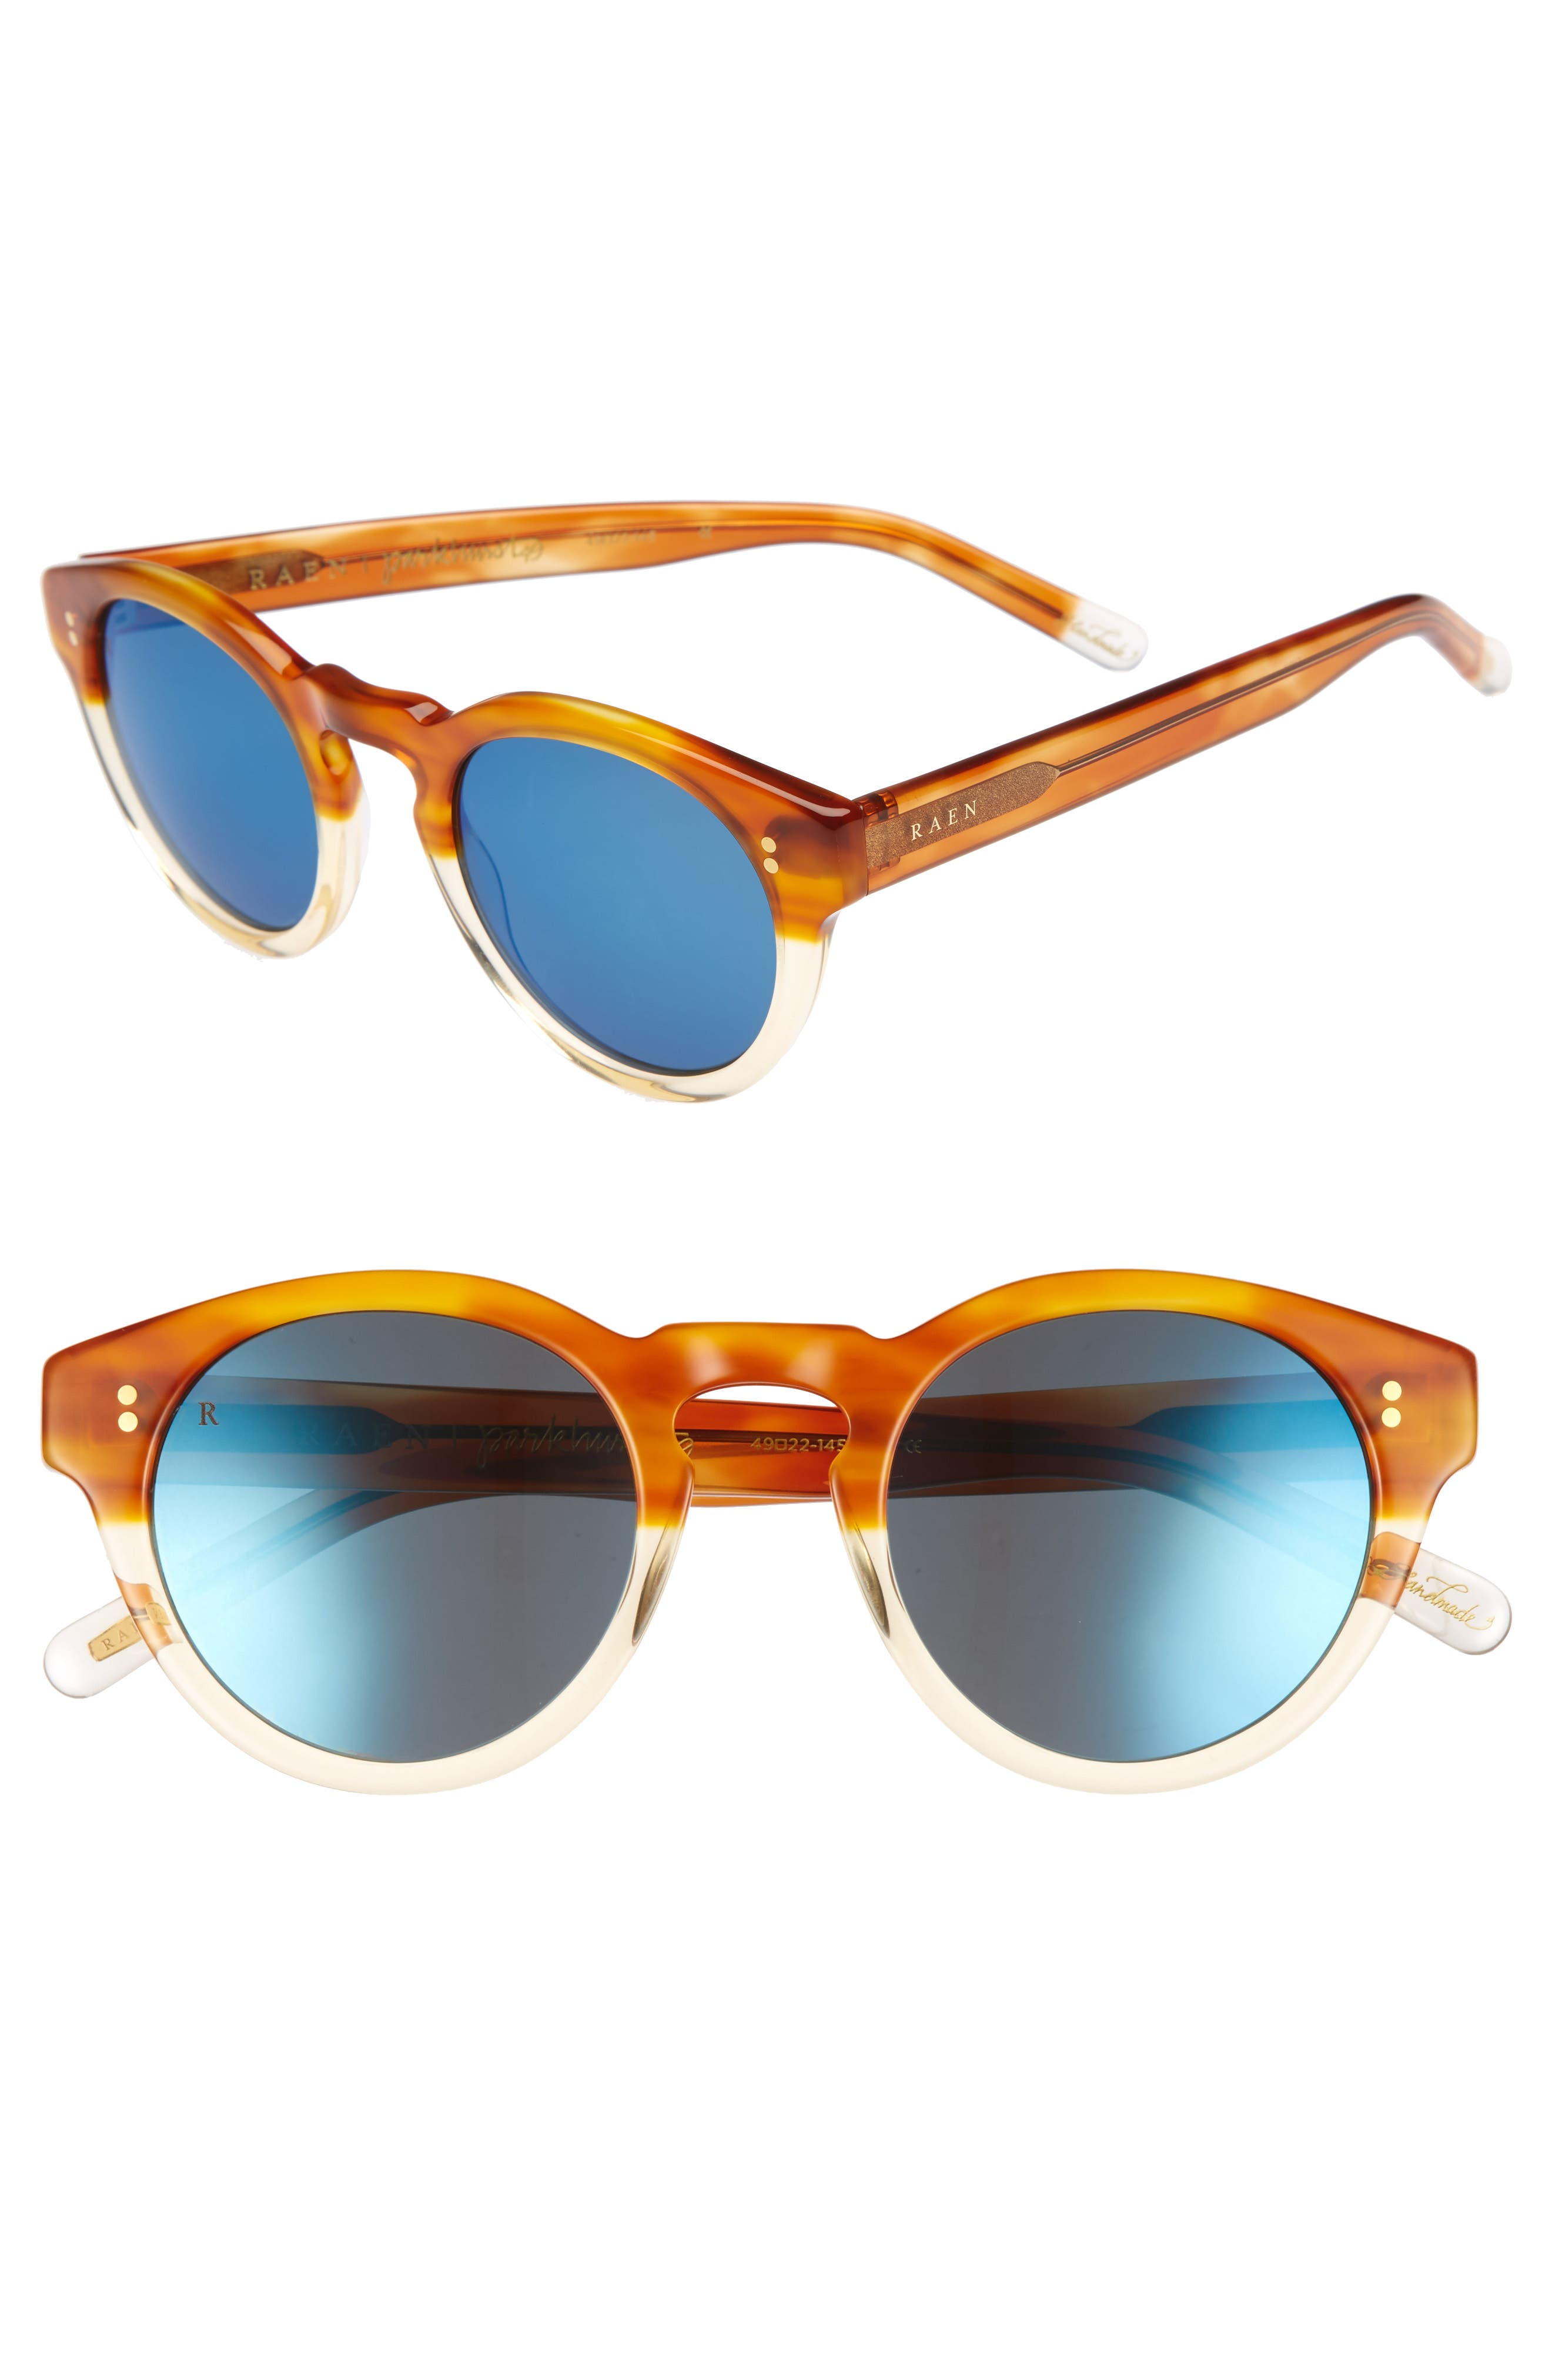 Parkhurst 49mm Sunglasses,                             Main thumbnail 1, color,                             206